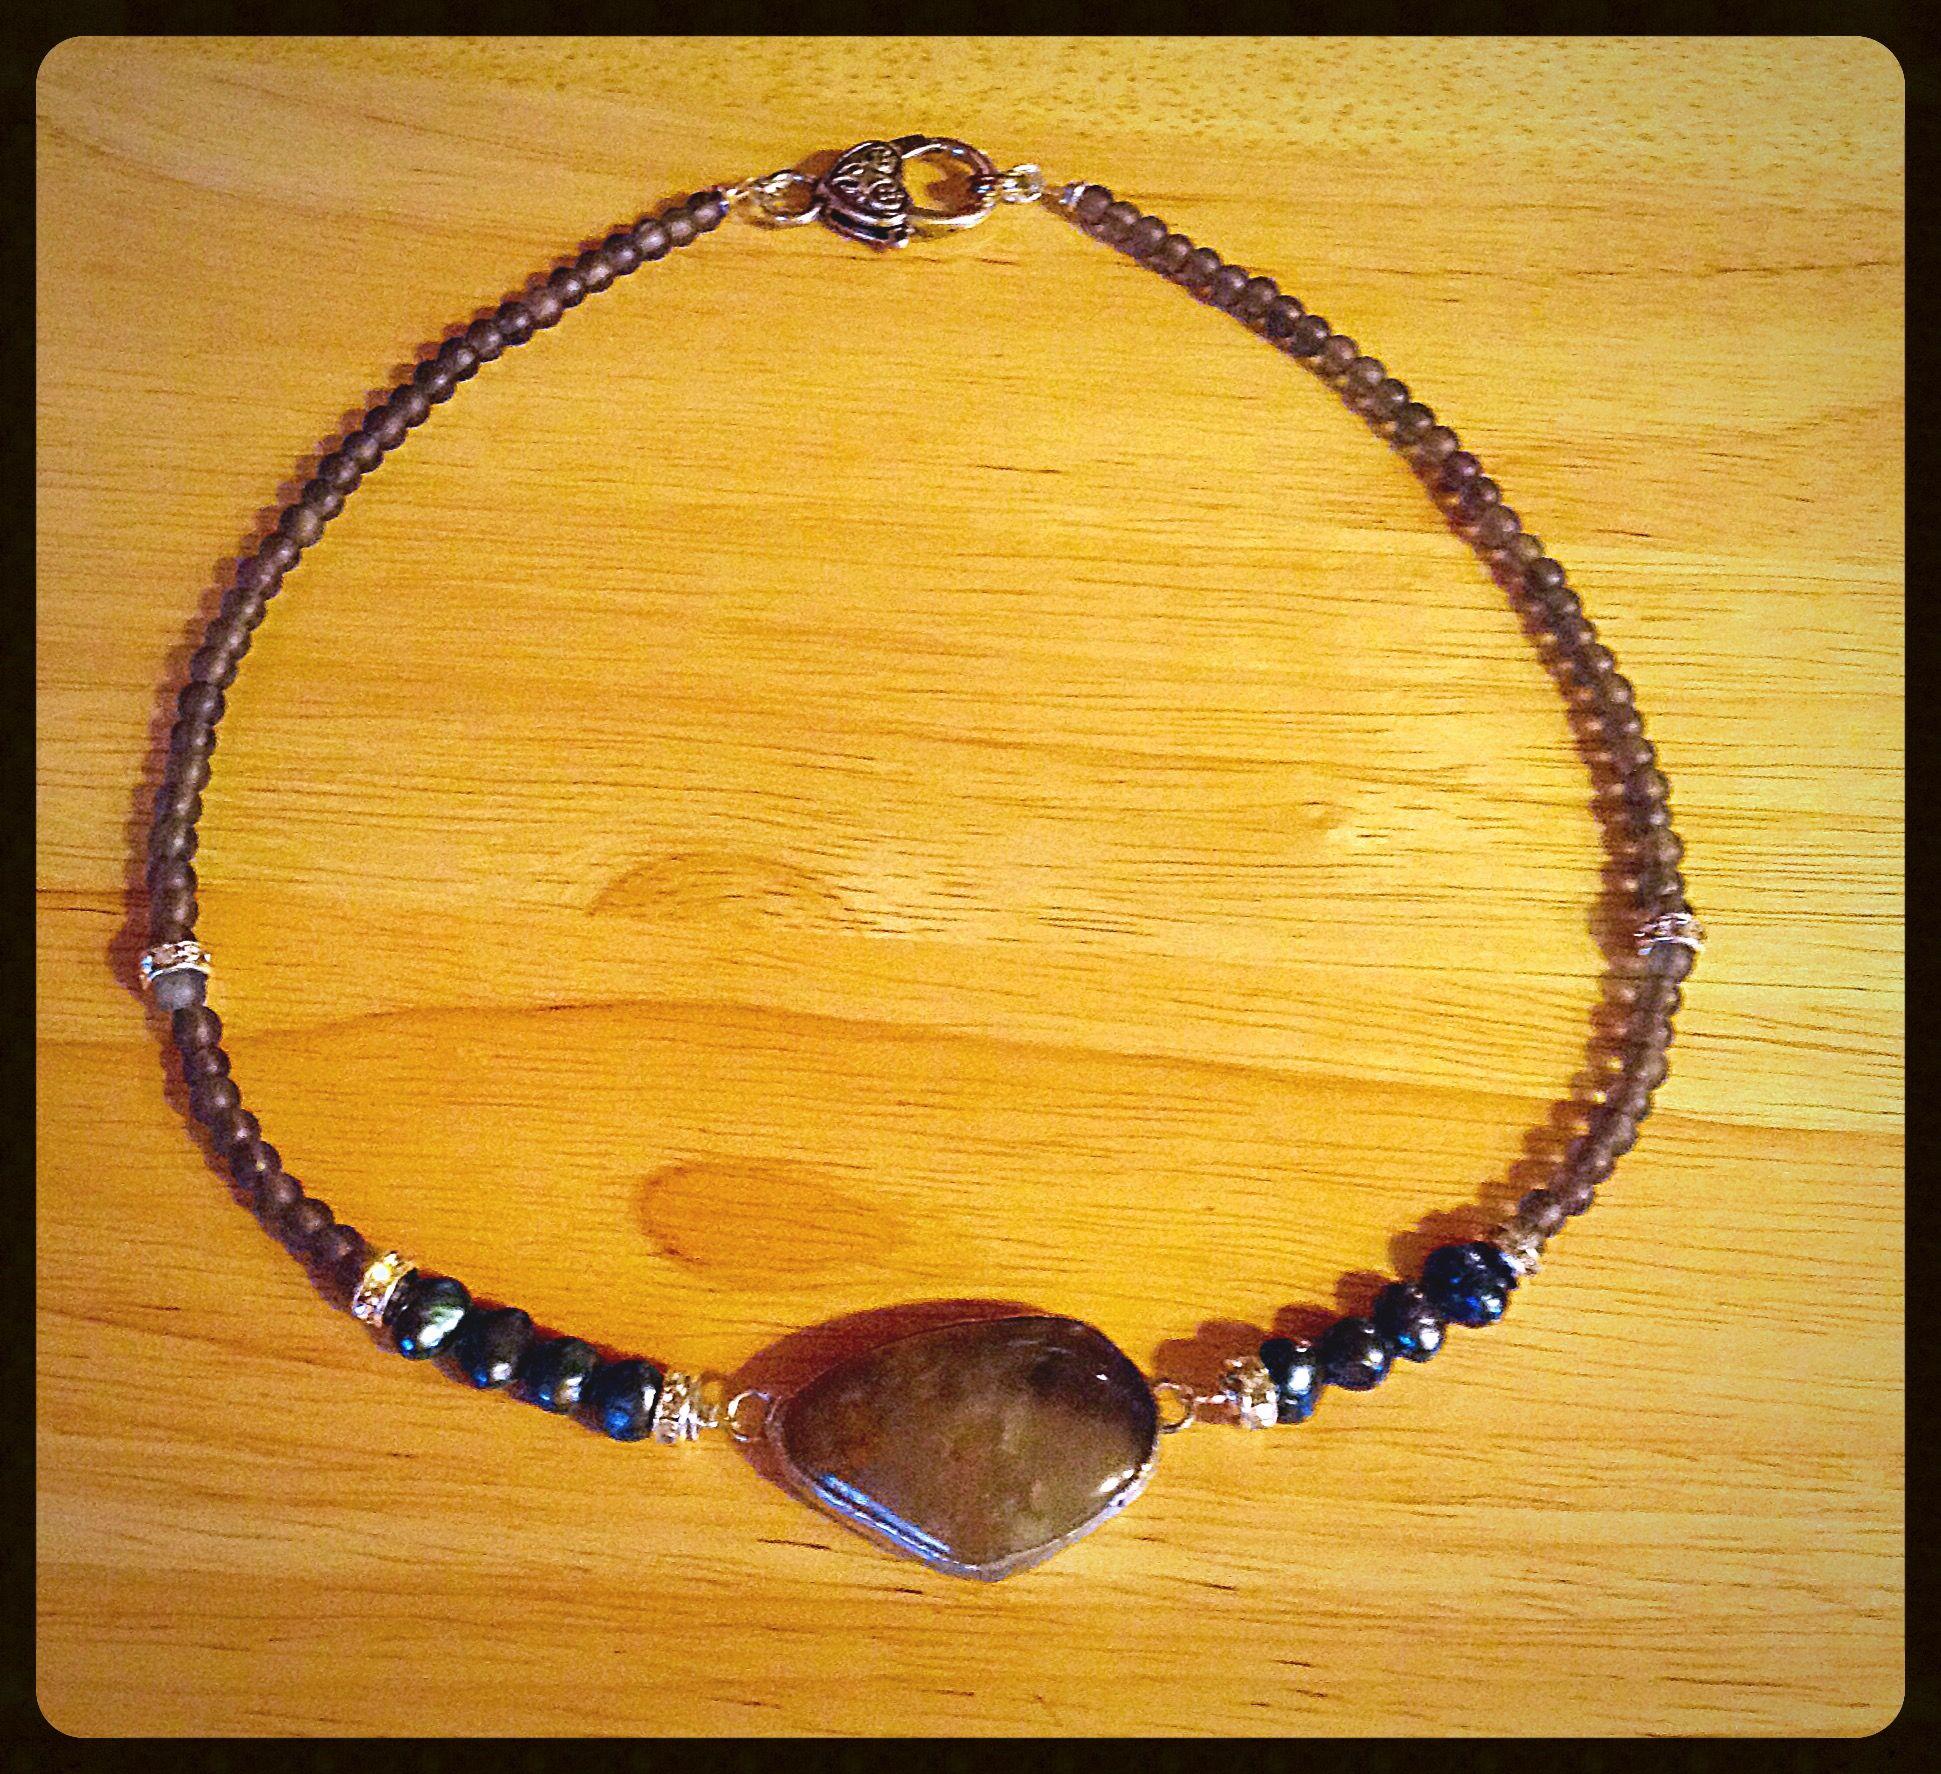 Natural Grey agate, black pearls, statement chocker necklace, crystal roundel Swarovski beads, gemstone, mala, statement necklace, layer necklaces, boho, bohemian, gipsy, gypsy, zen, Buddha, beads, silver,